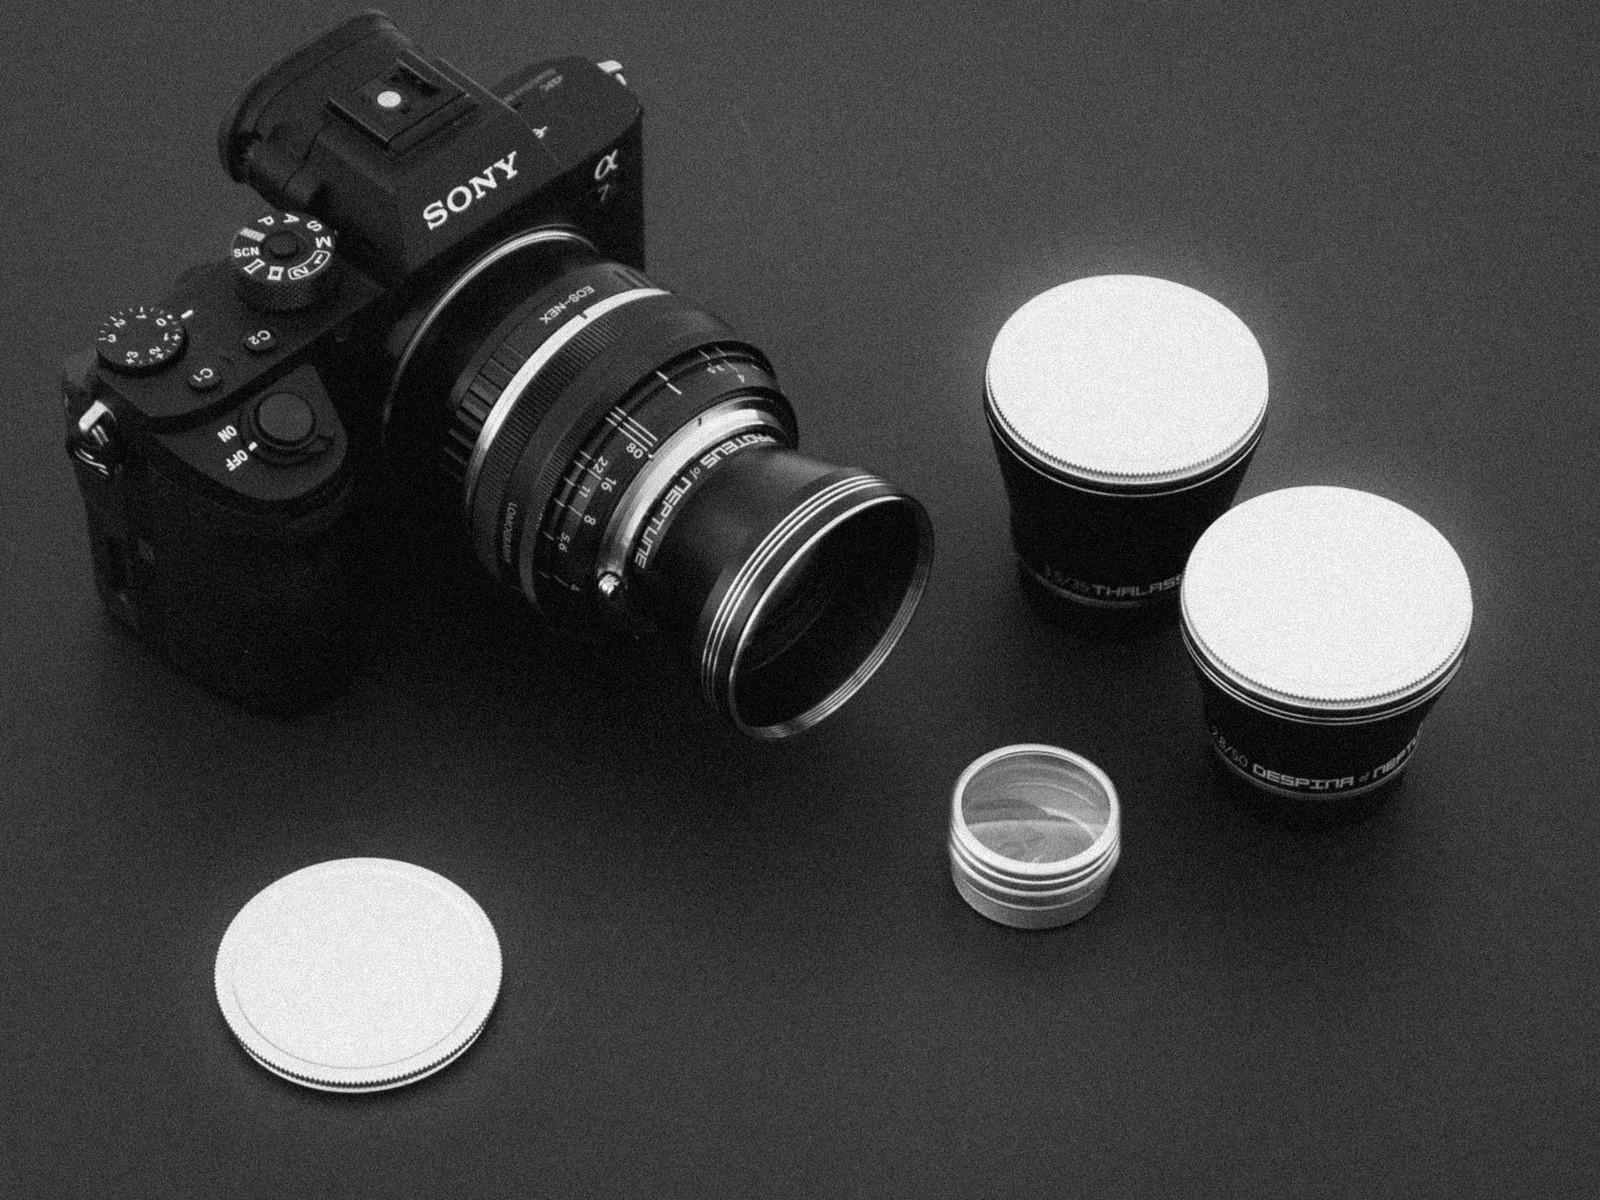 Lomography Neptune objektiver på Sony A7r ii